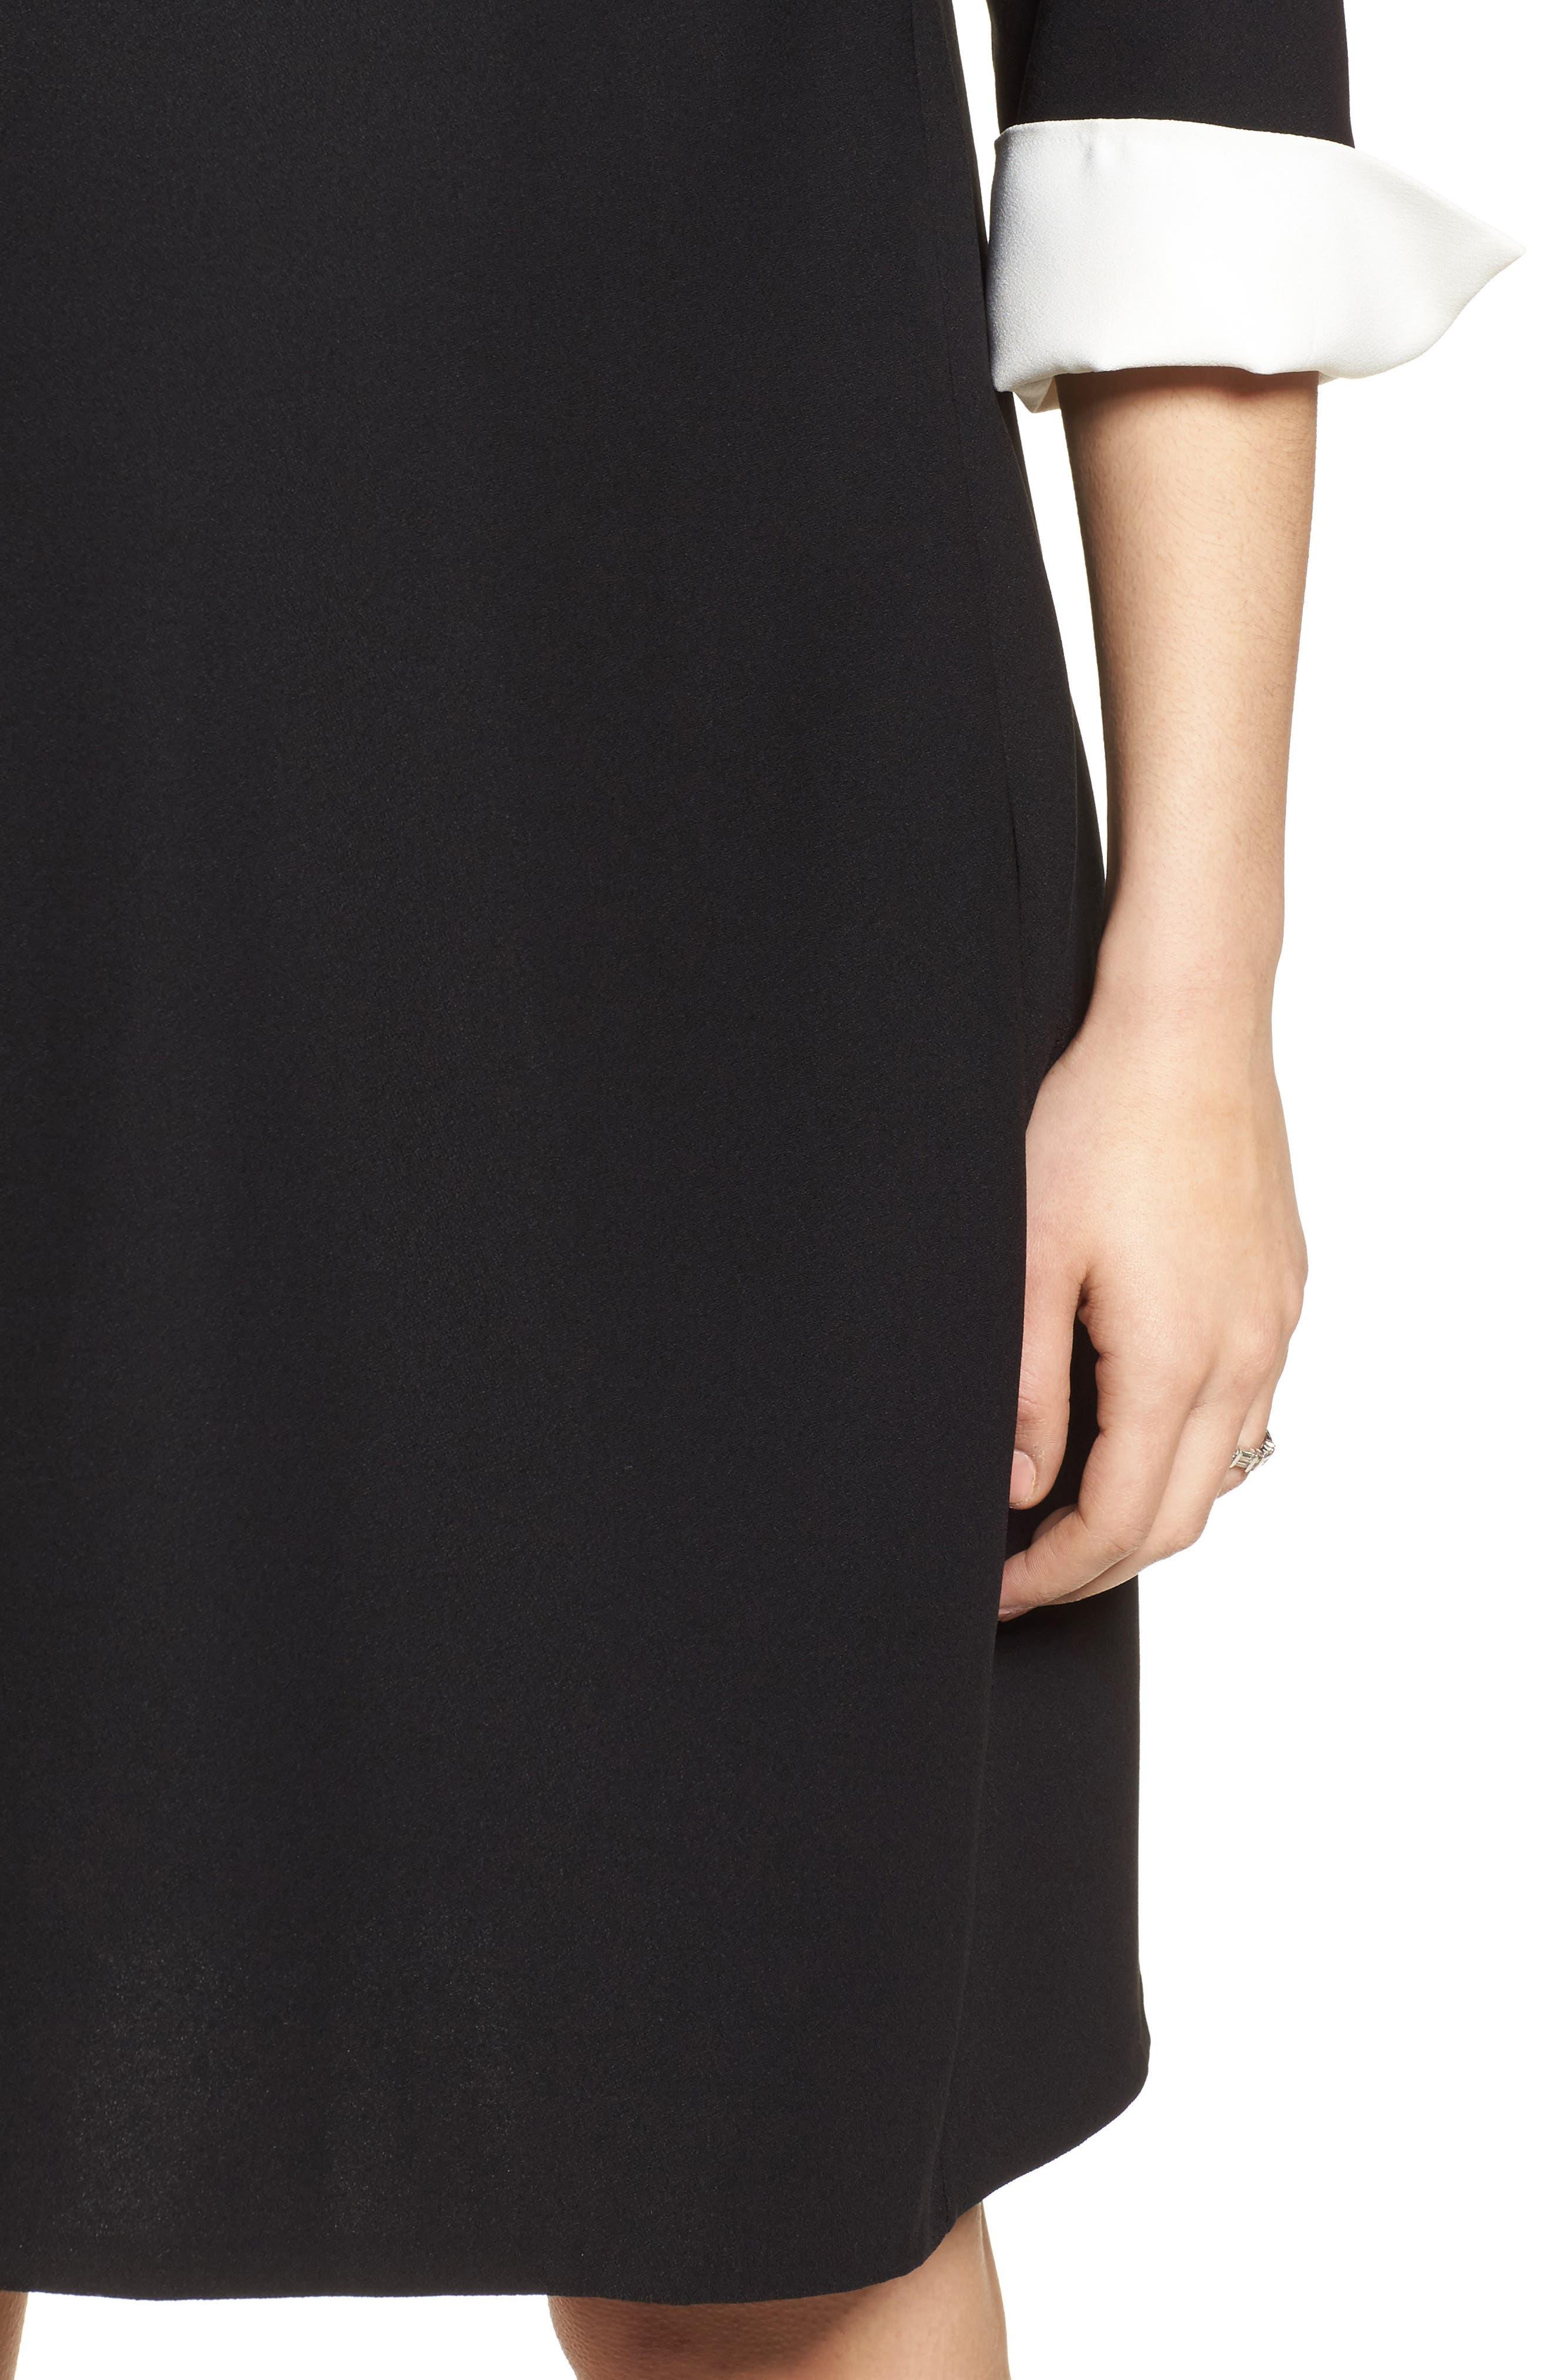 Rosa Maternity Dress,                             Alternate thumbnail 4, color,                             Caviar Black